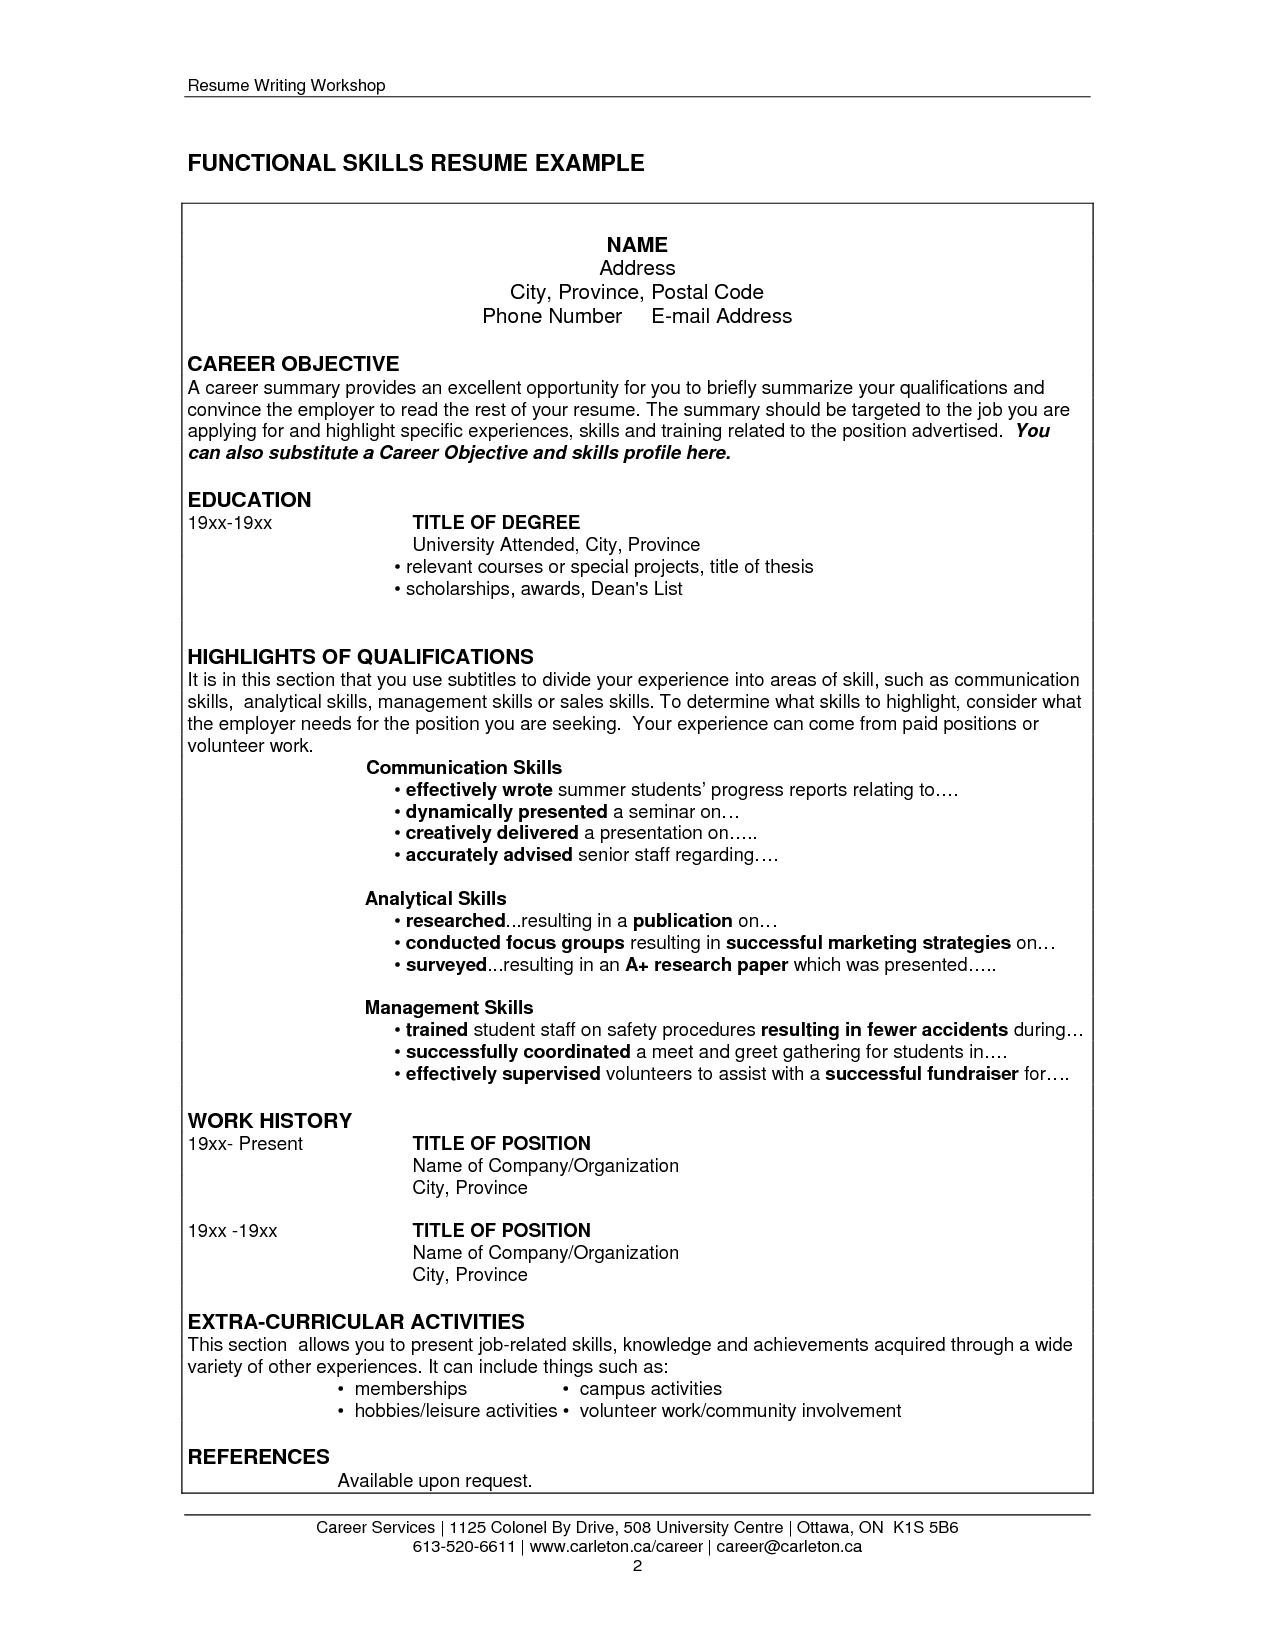 Image Result For Skills Resume Format Business Pinterest